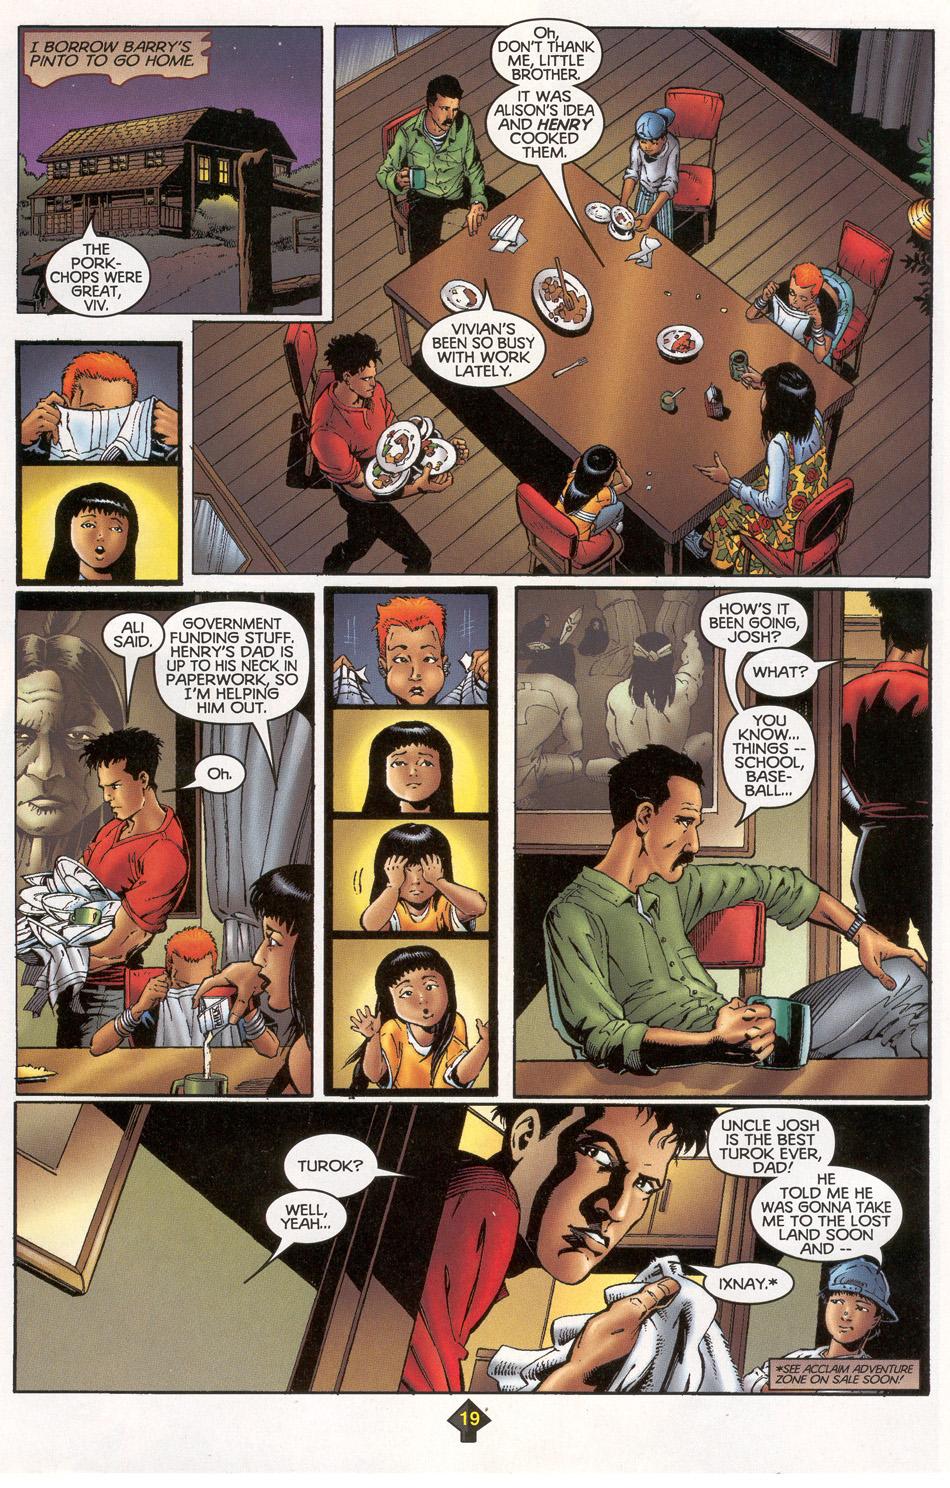 Read online Turok: Redpath comic -  Issue # Full - 18